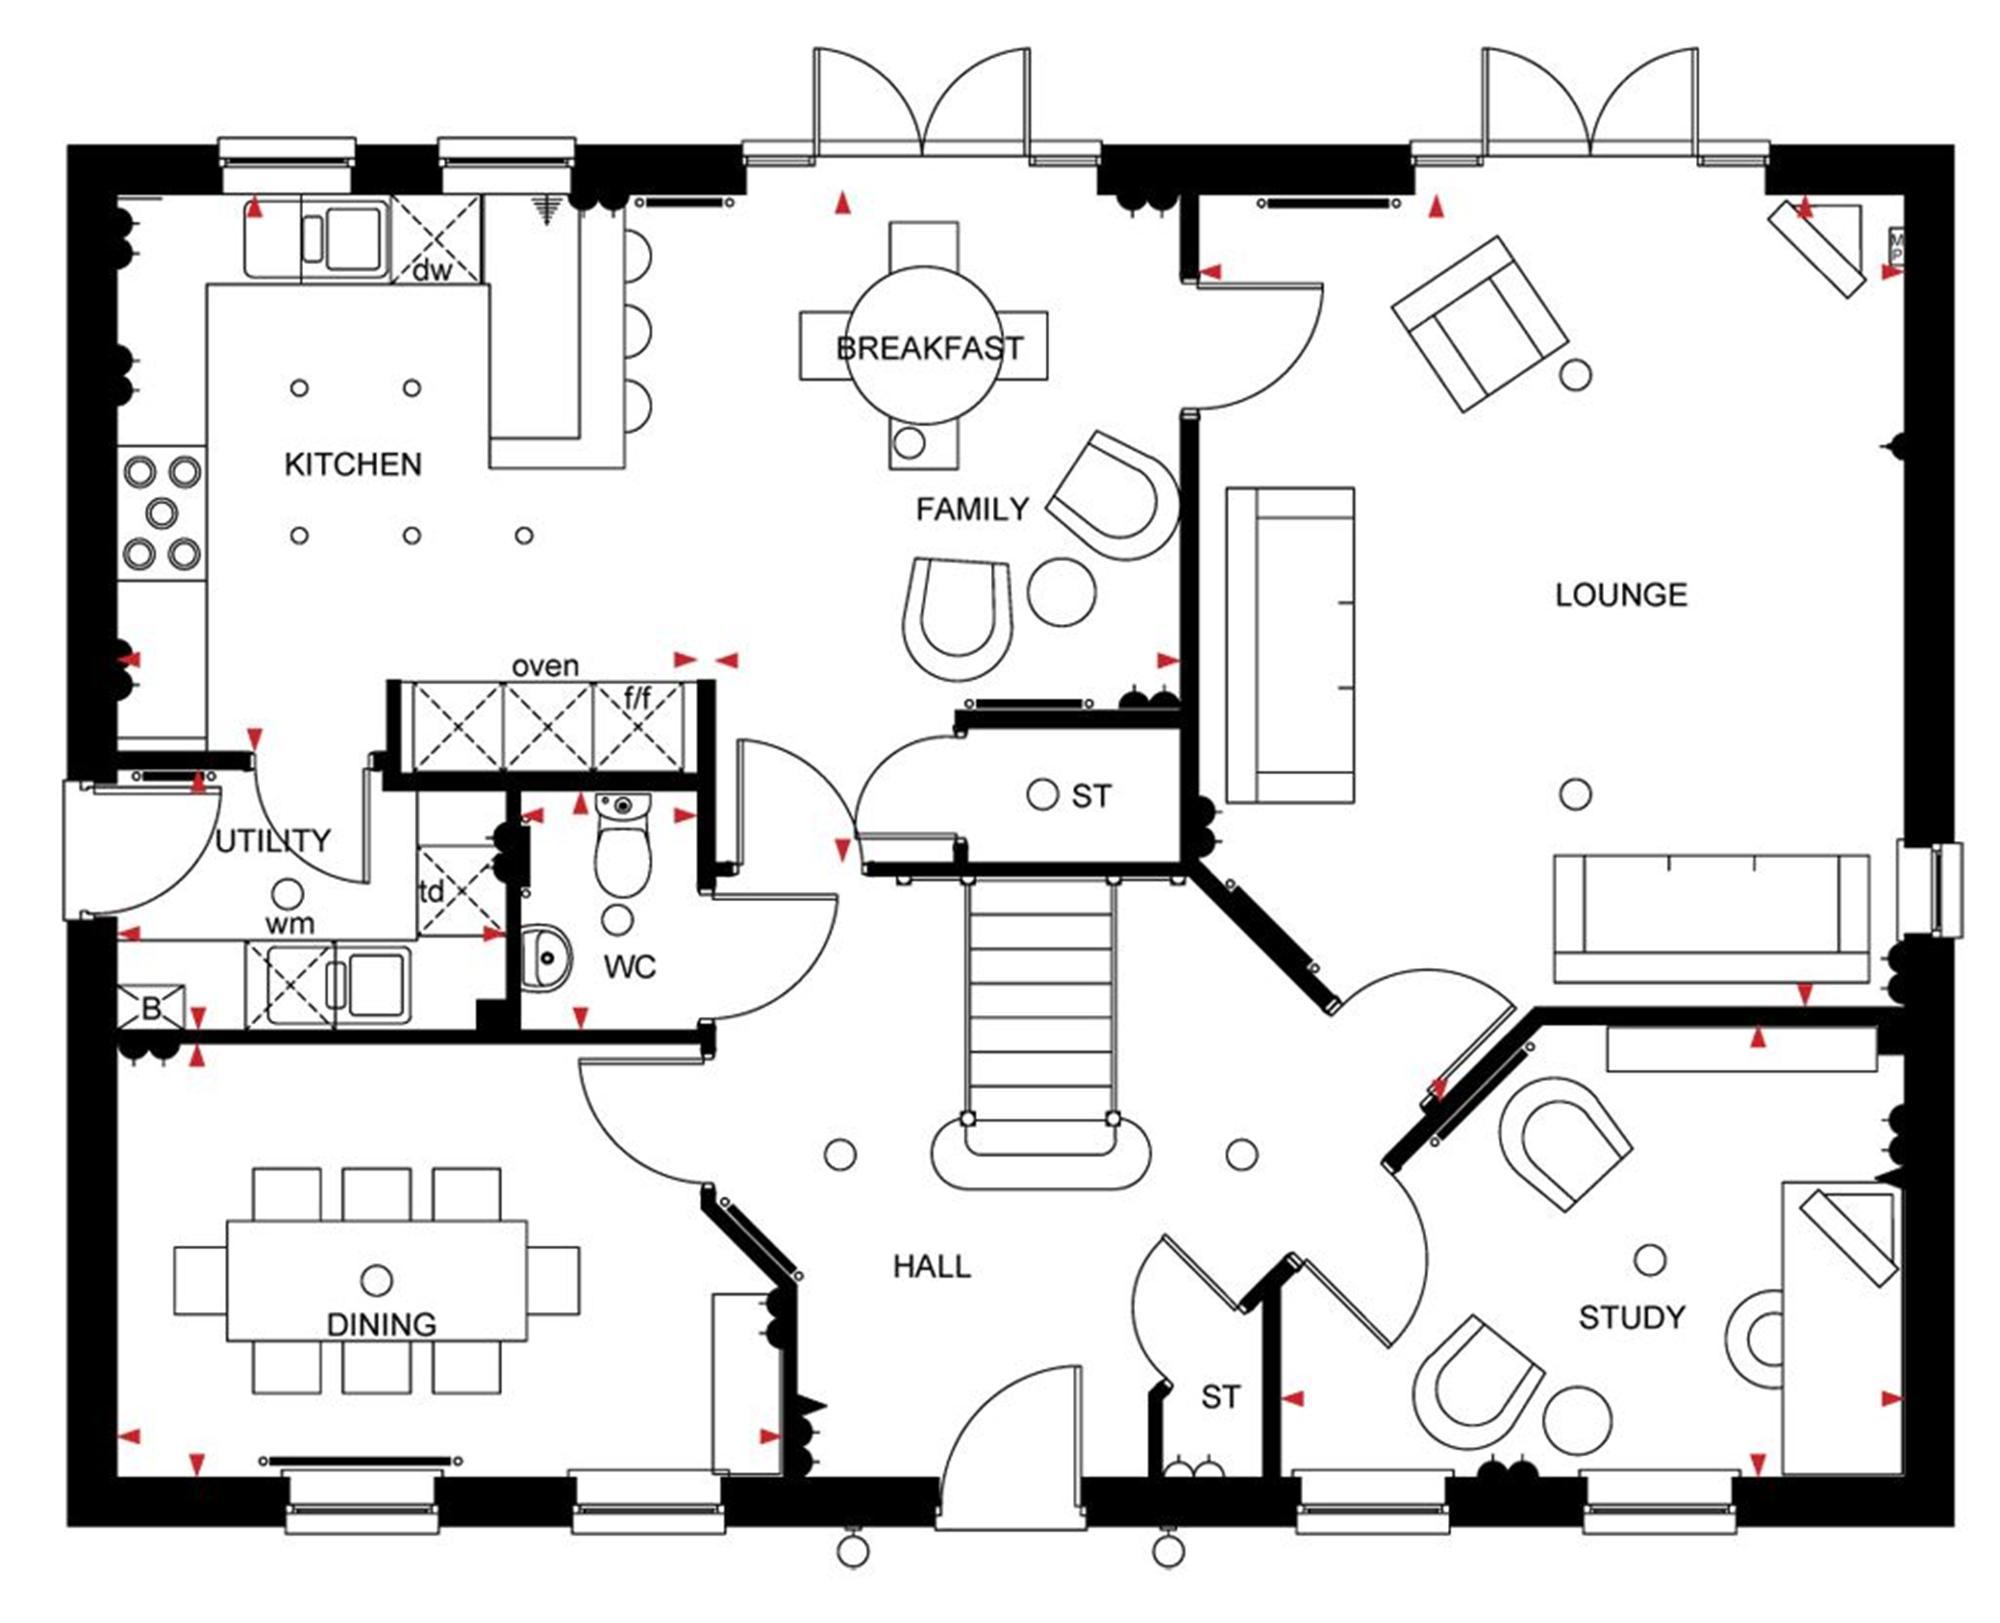 David wilson homes chelworth floor plan for David homes floor plans